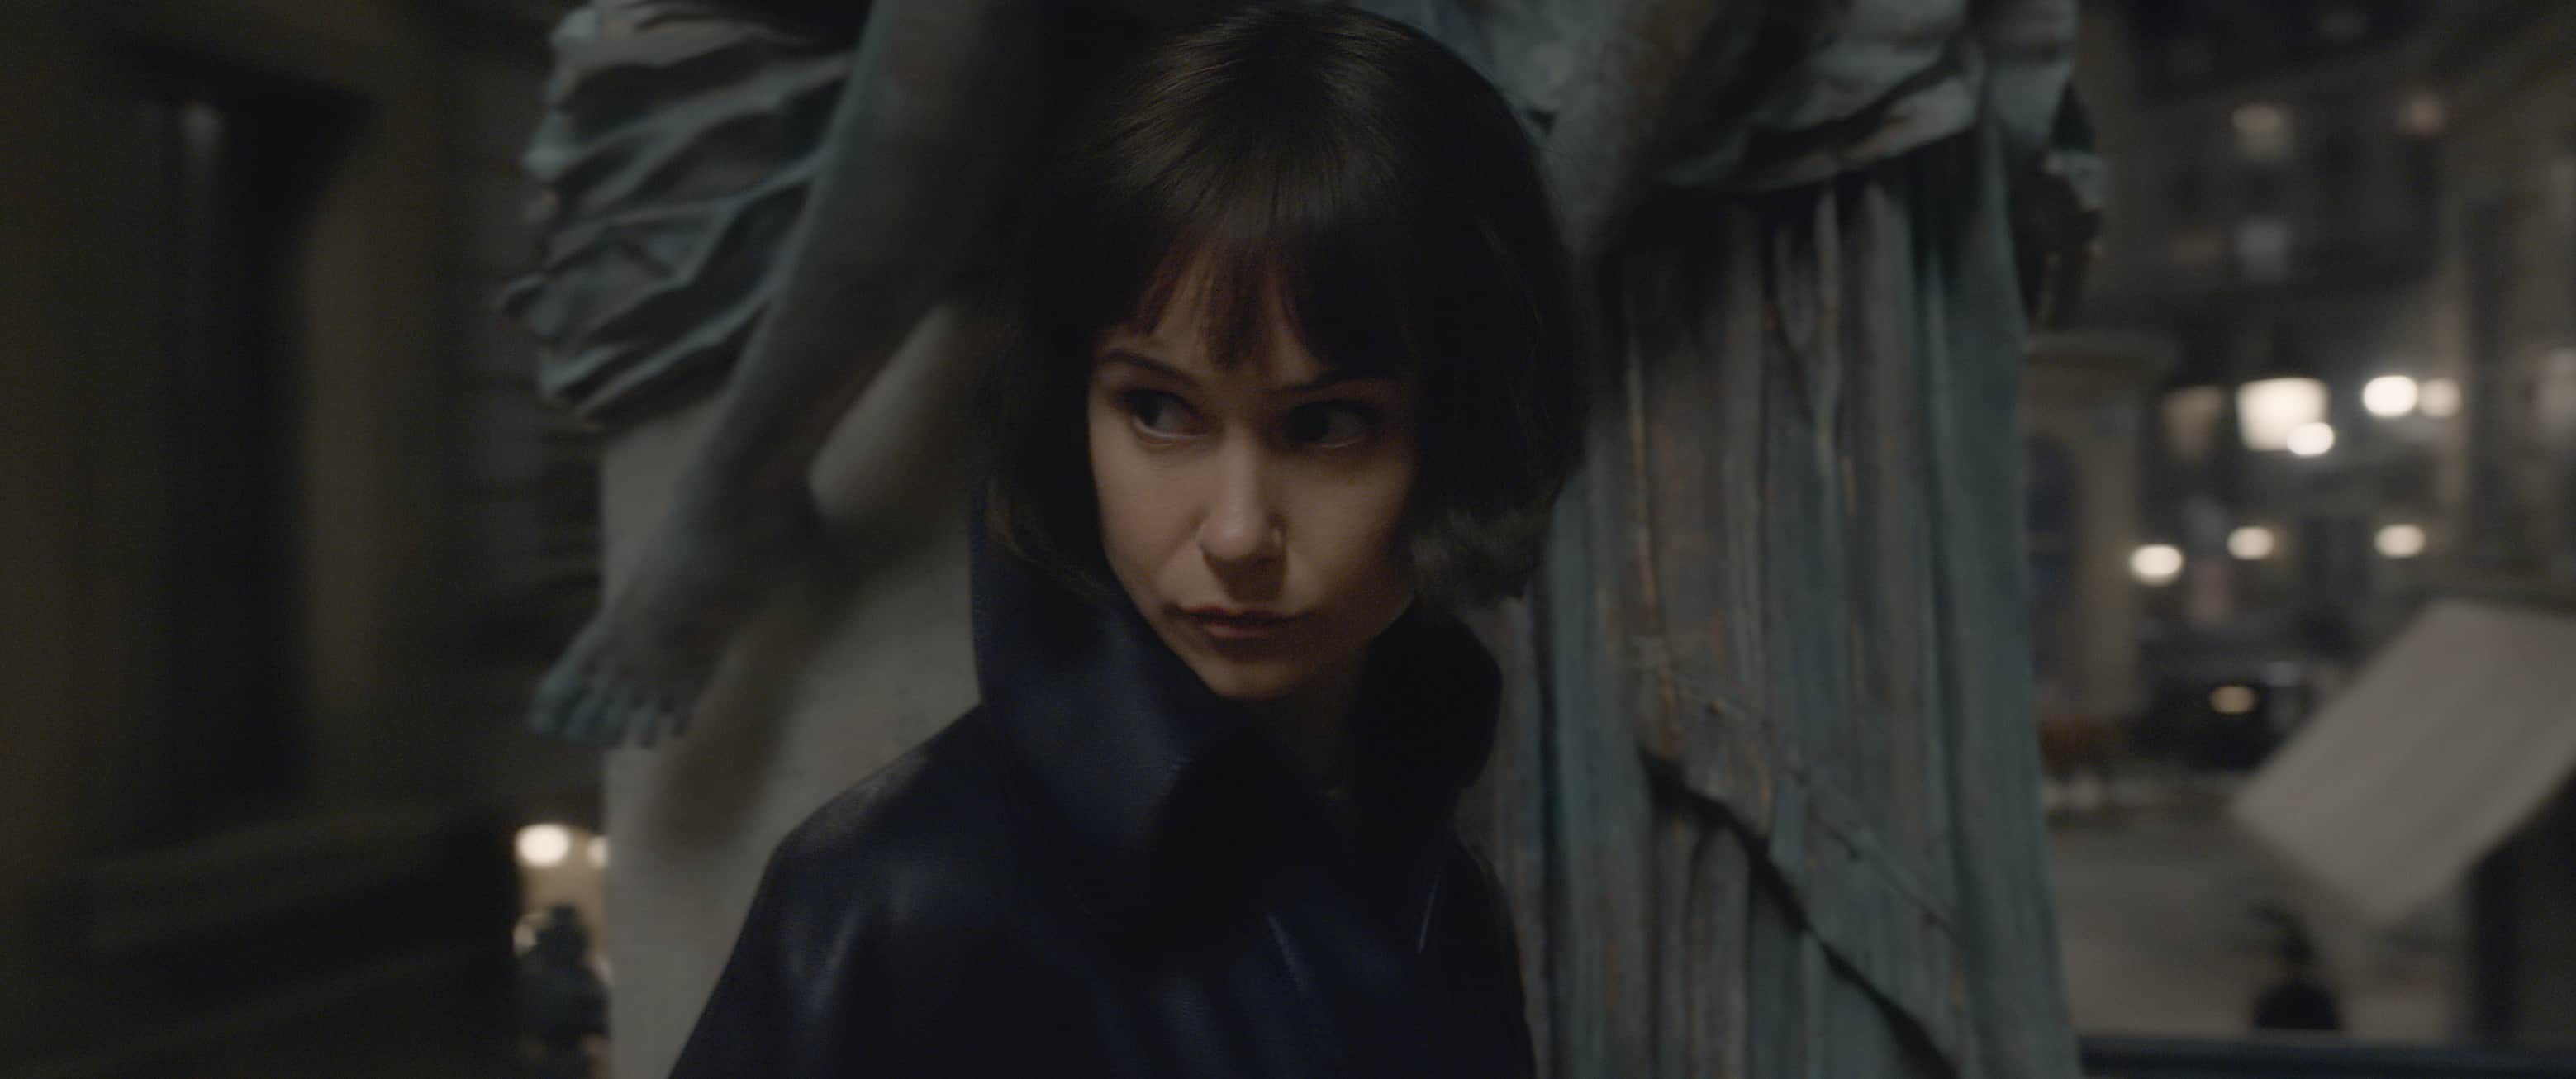 Potterish SPOILERS: 7 dúvidas que tivemos ao assistir Os Crimes de Grindelwald